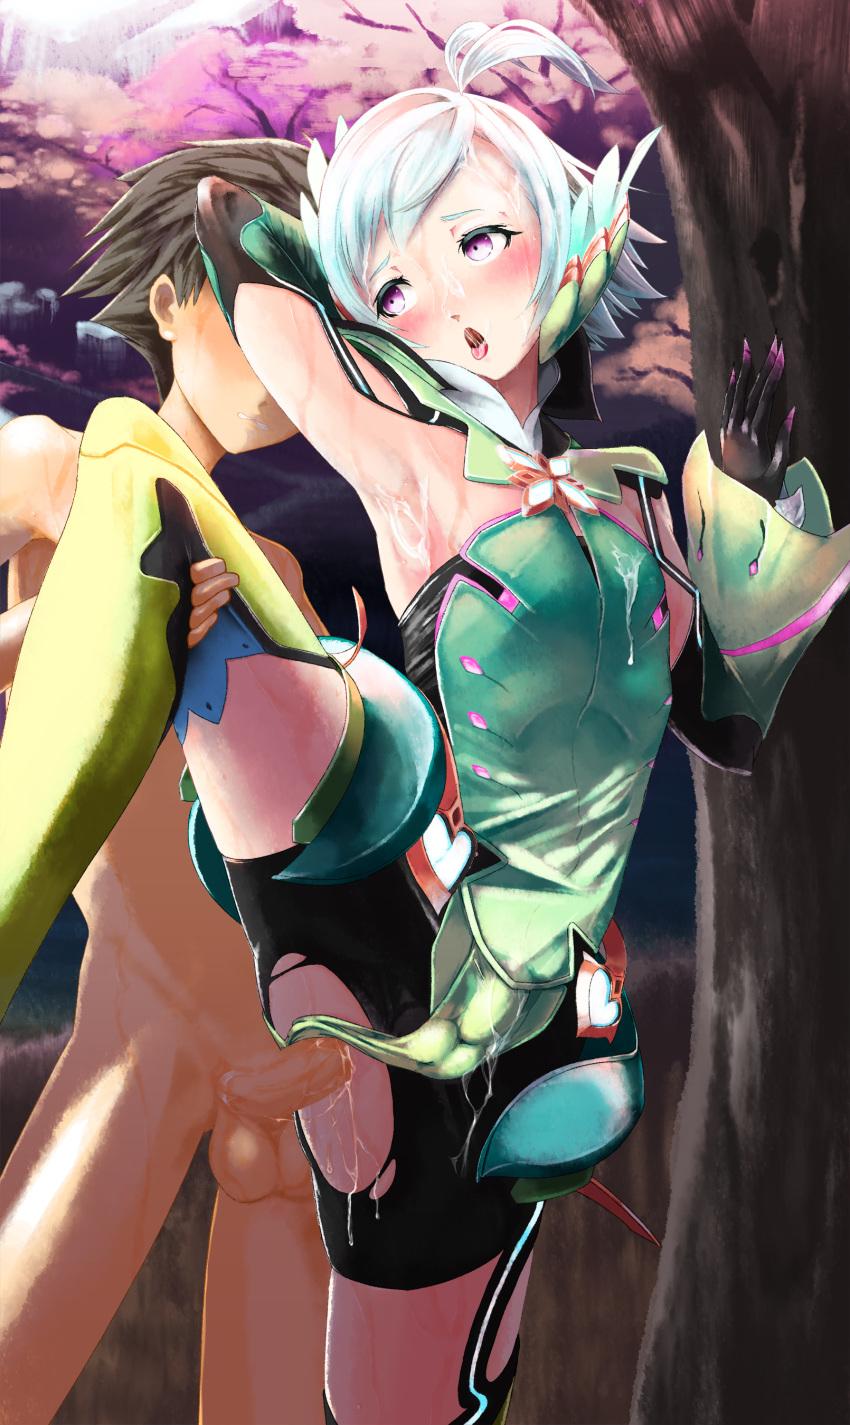 2 kos-mos chronicles xenoblade Good luck ninomiya-kun